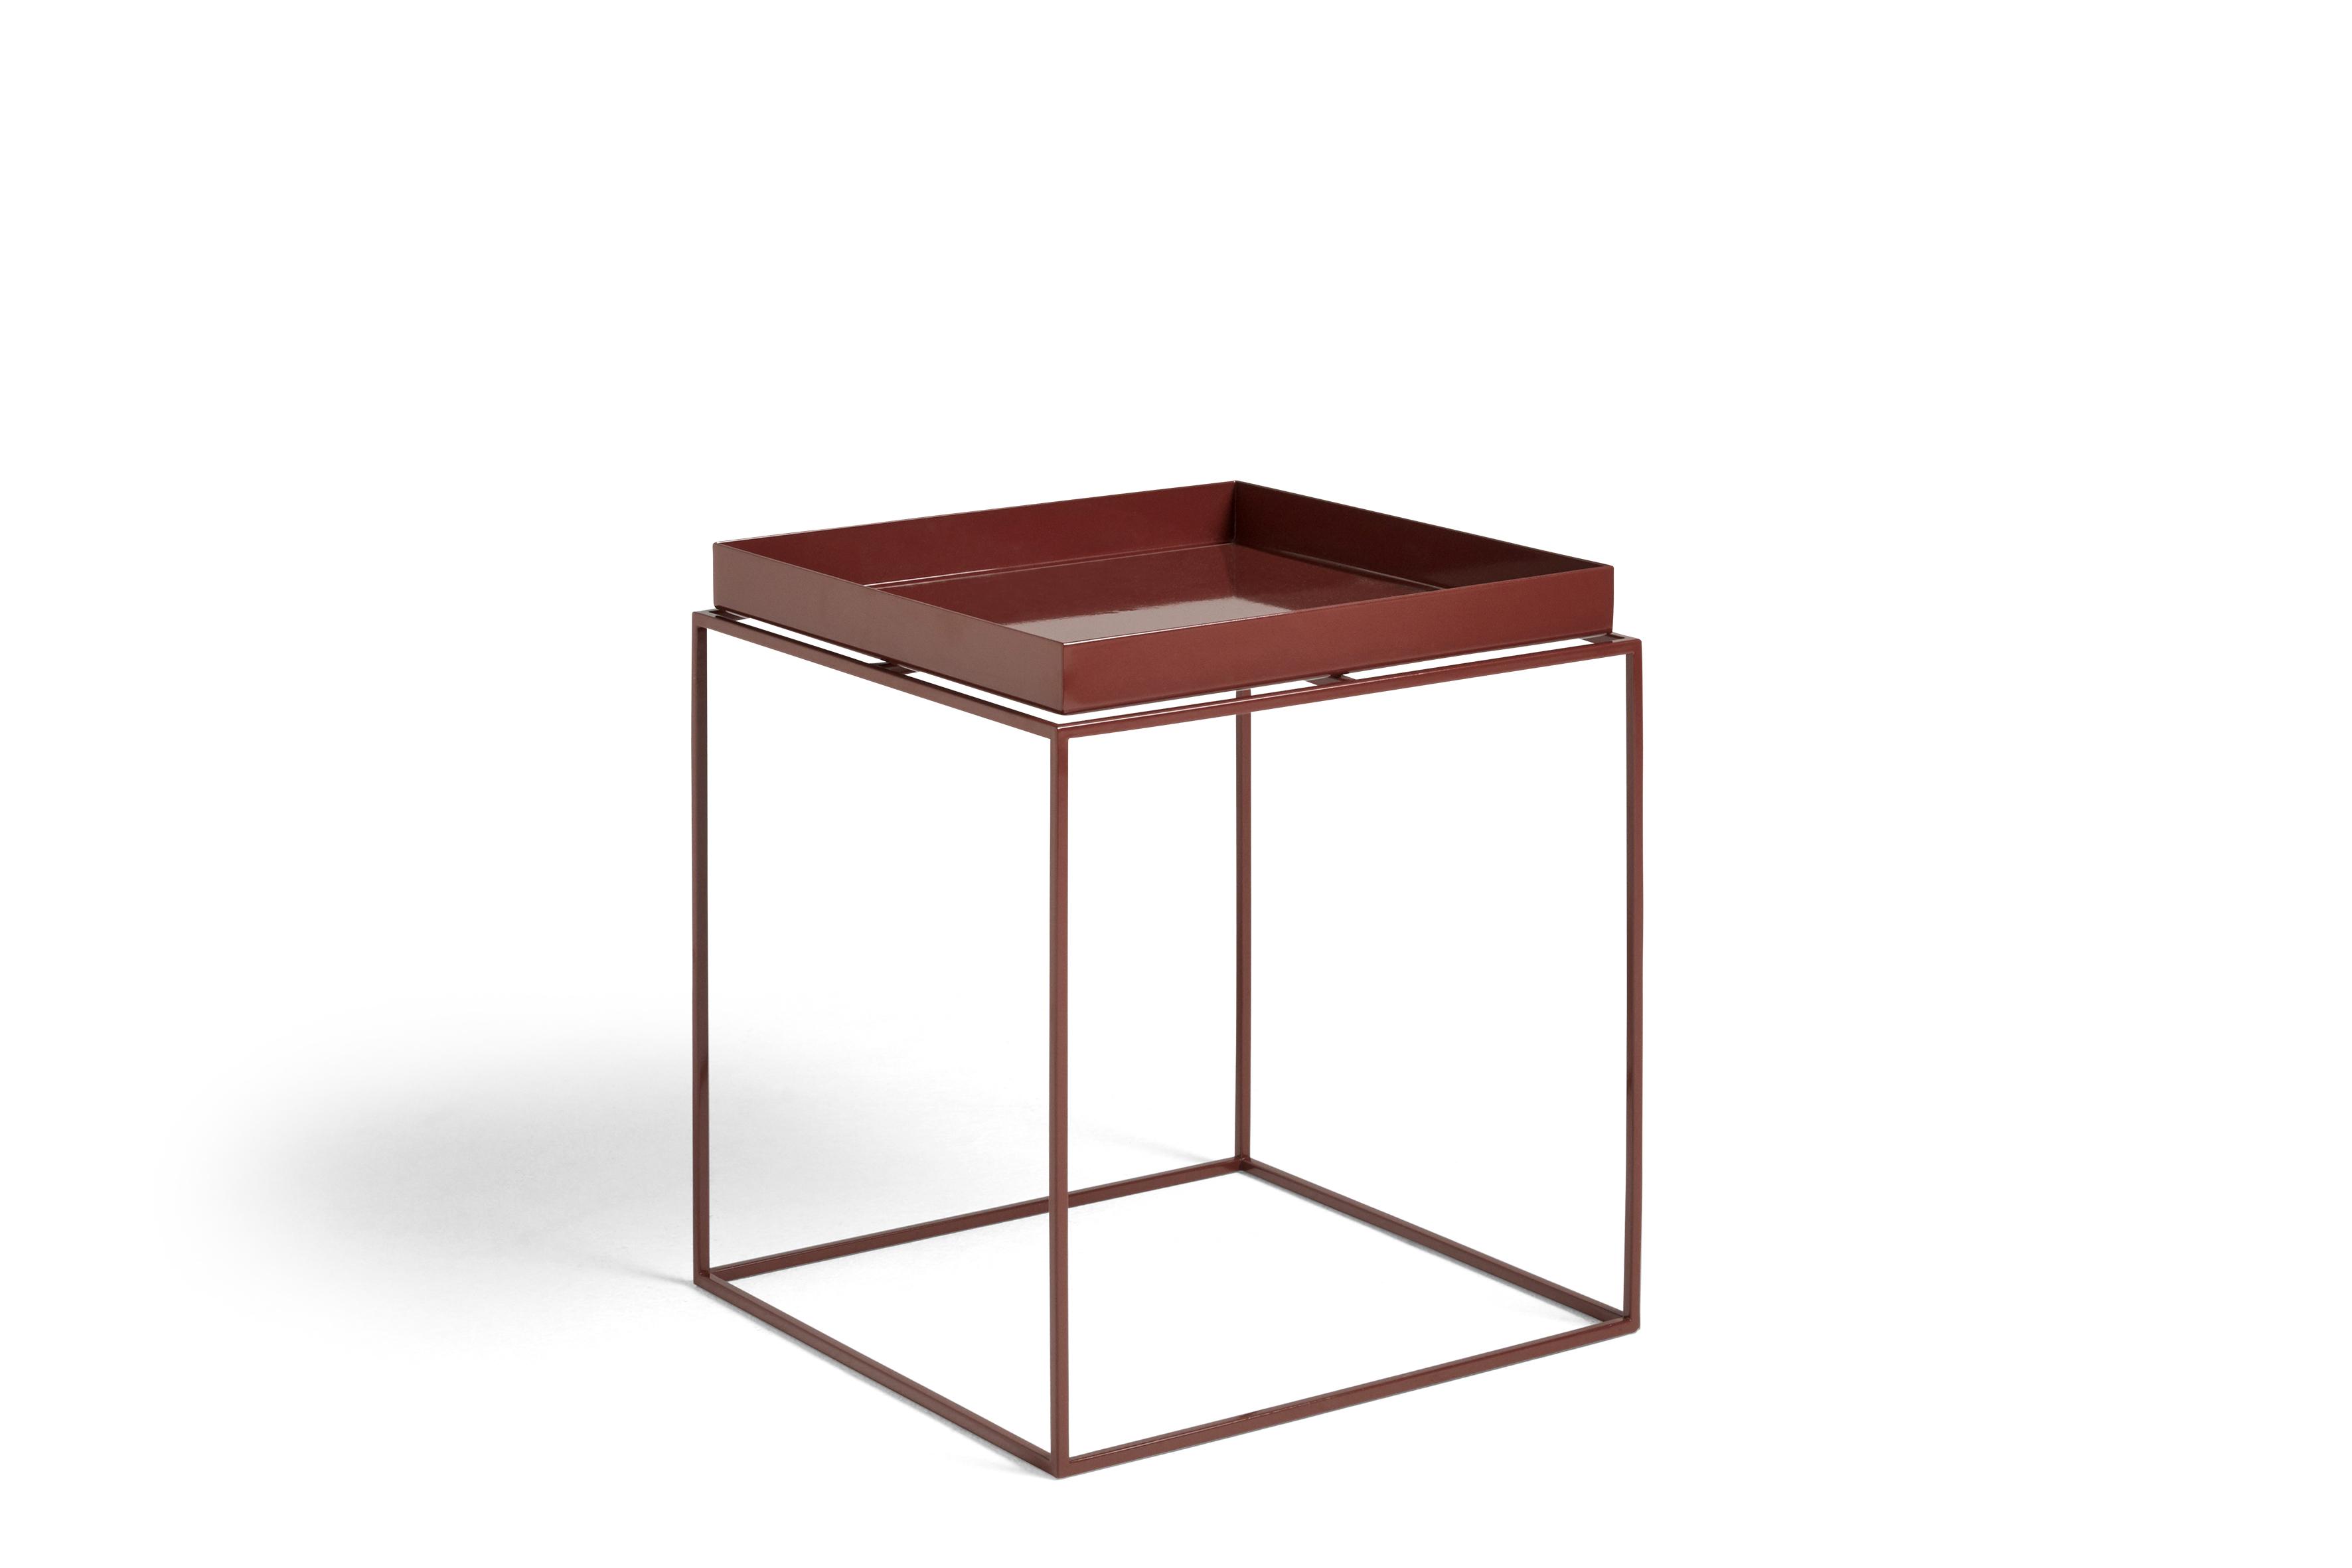 HAY - Tray Table 40 x 40 cm - Chocolate High Gloss (1025033029000)